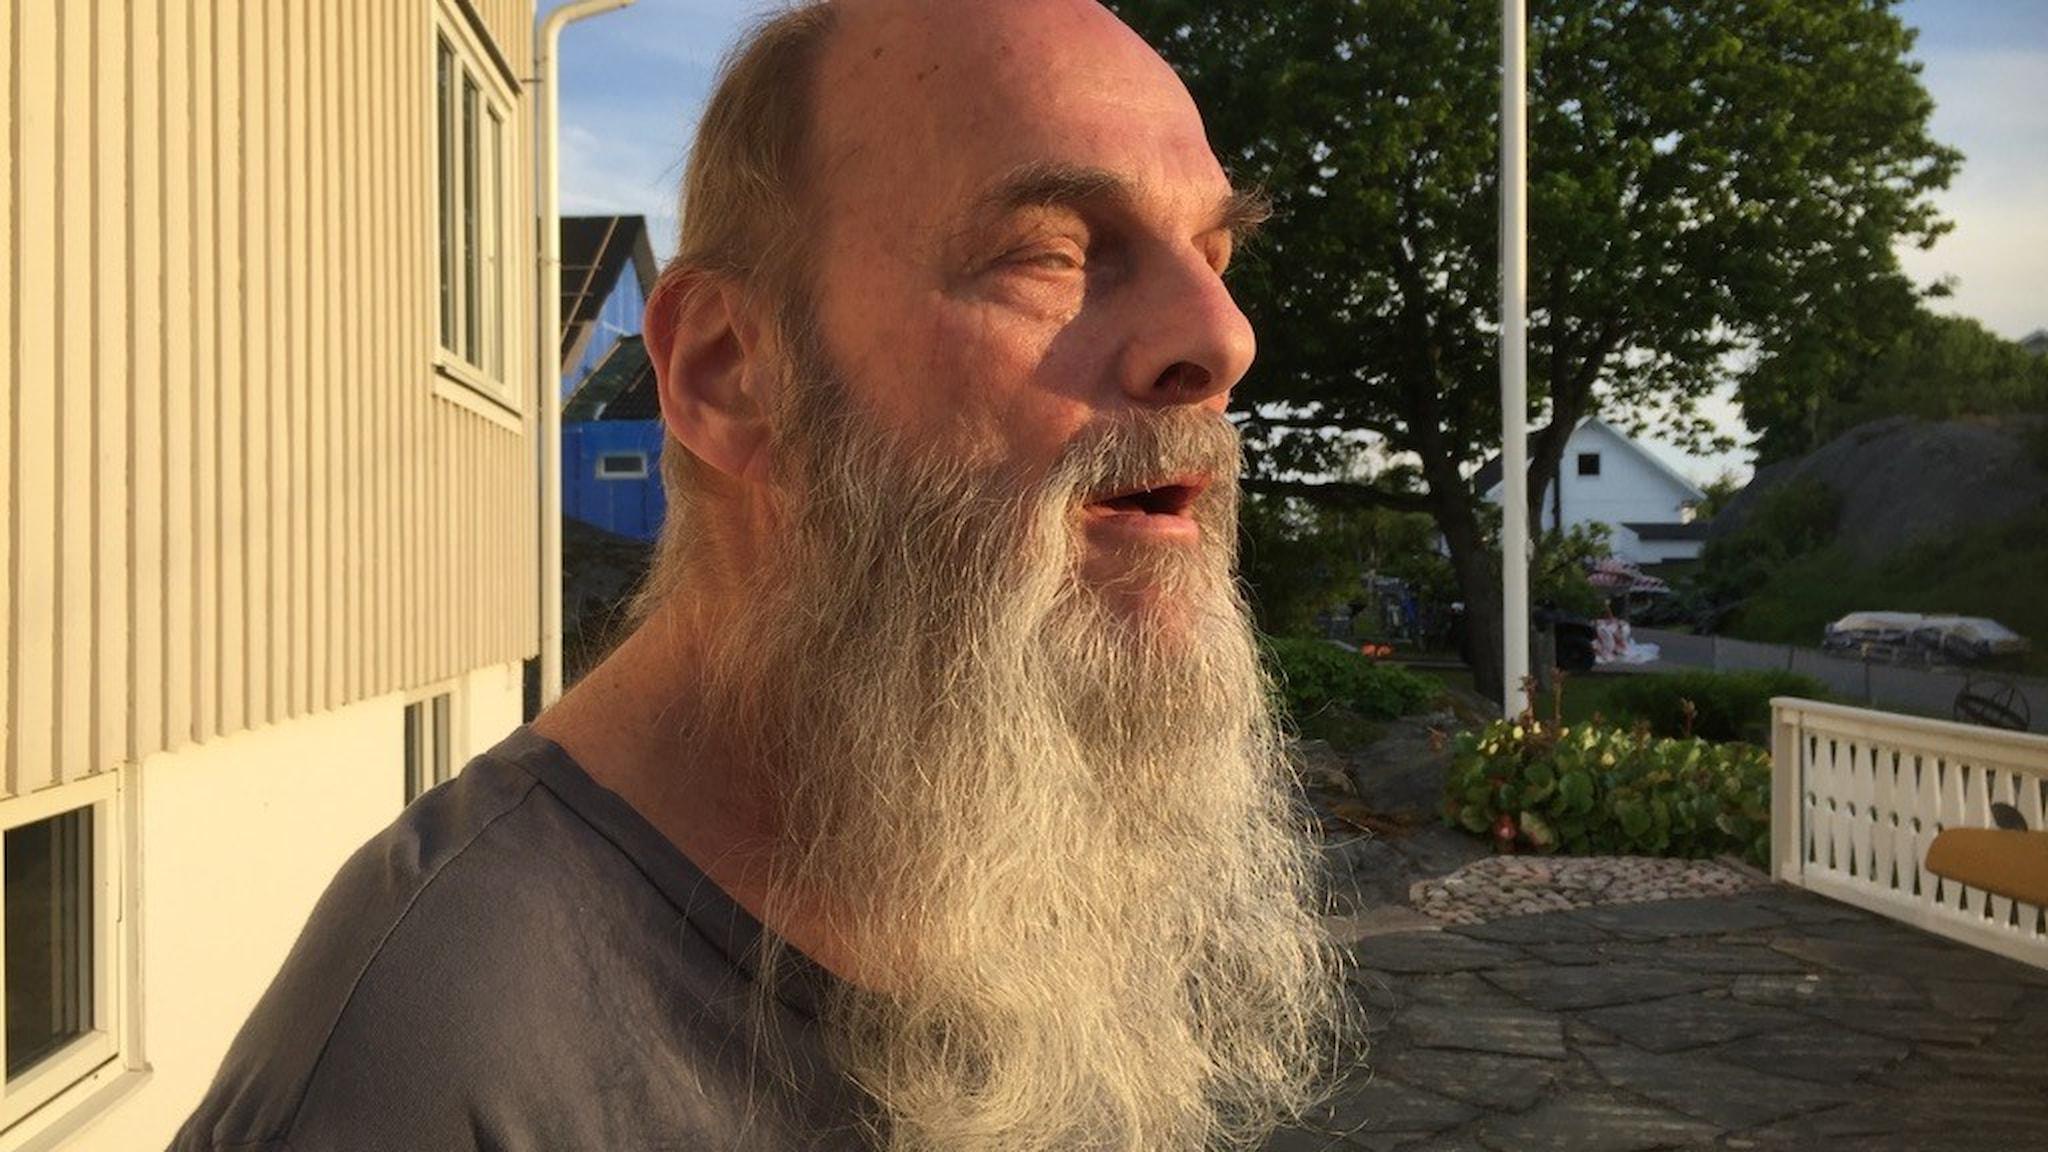 Leif Sunesson, fotad från sidan, lyssnandes.